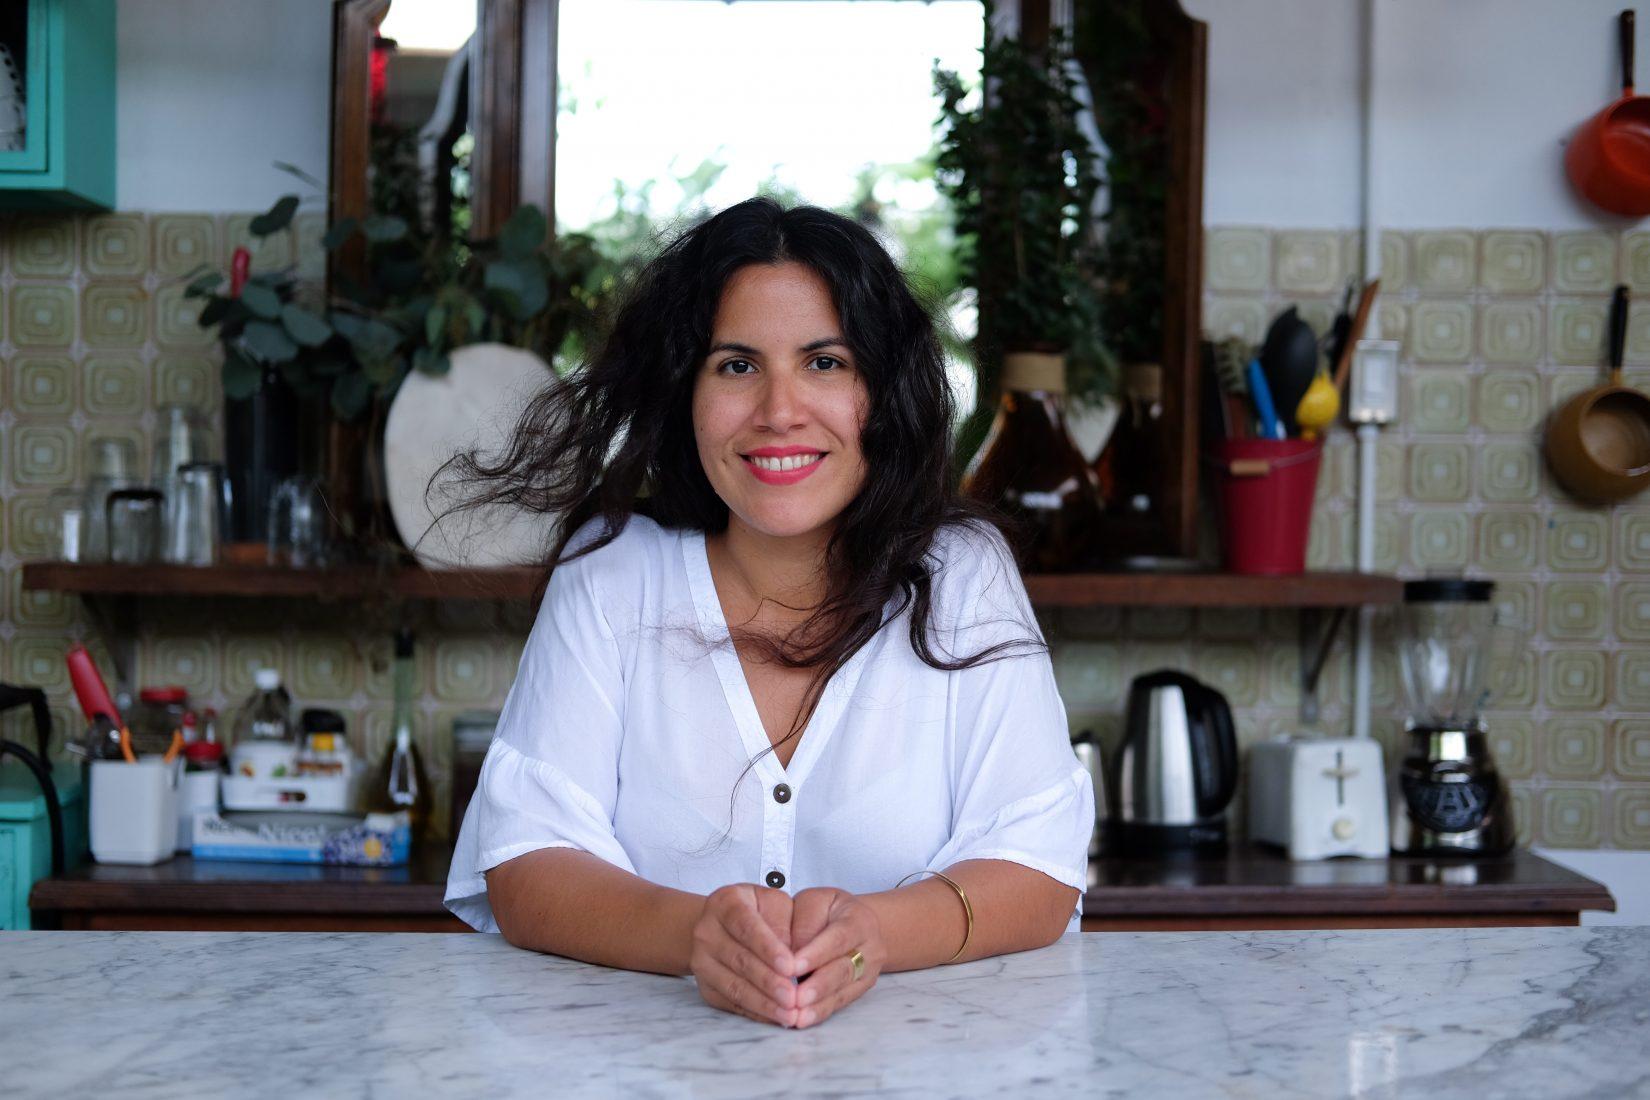 Meet Puerto Rico's Hidden Pearl in the Culinary World, Chef Natalia Vallejo